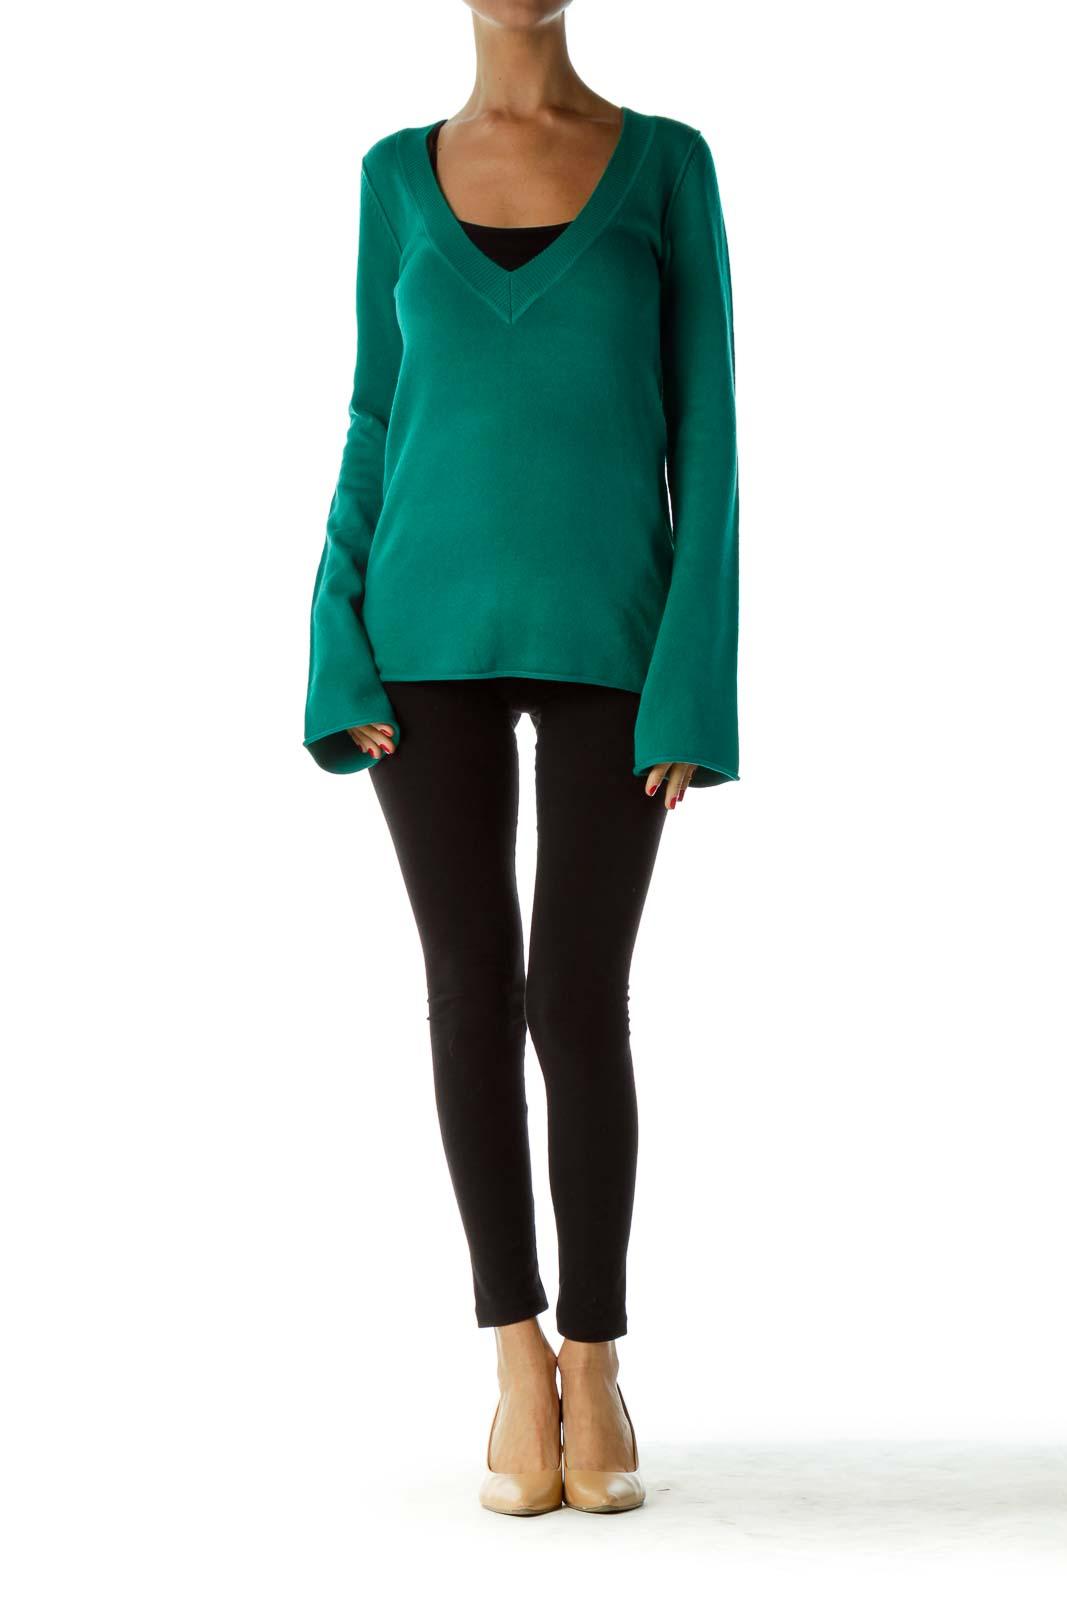 Green Knit V-Neck Sweater